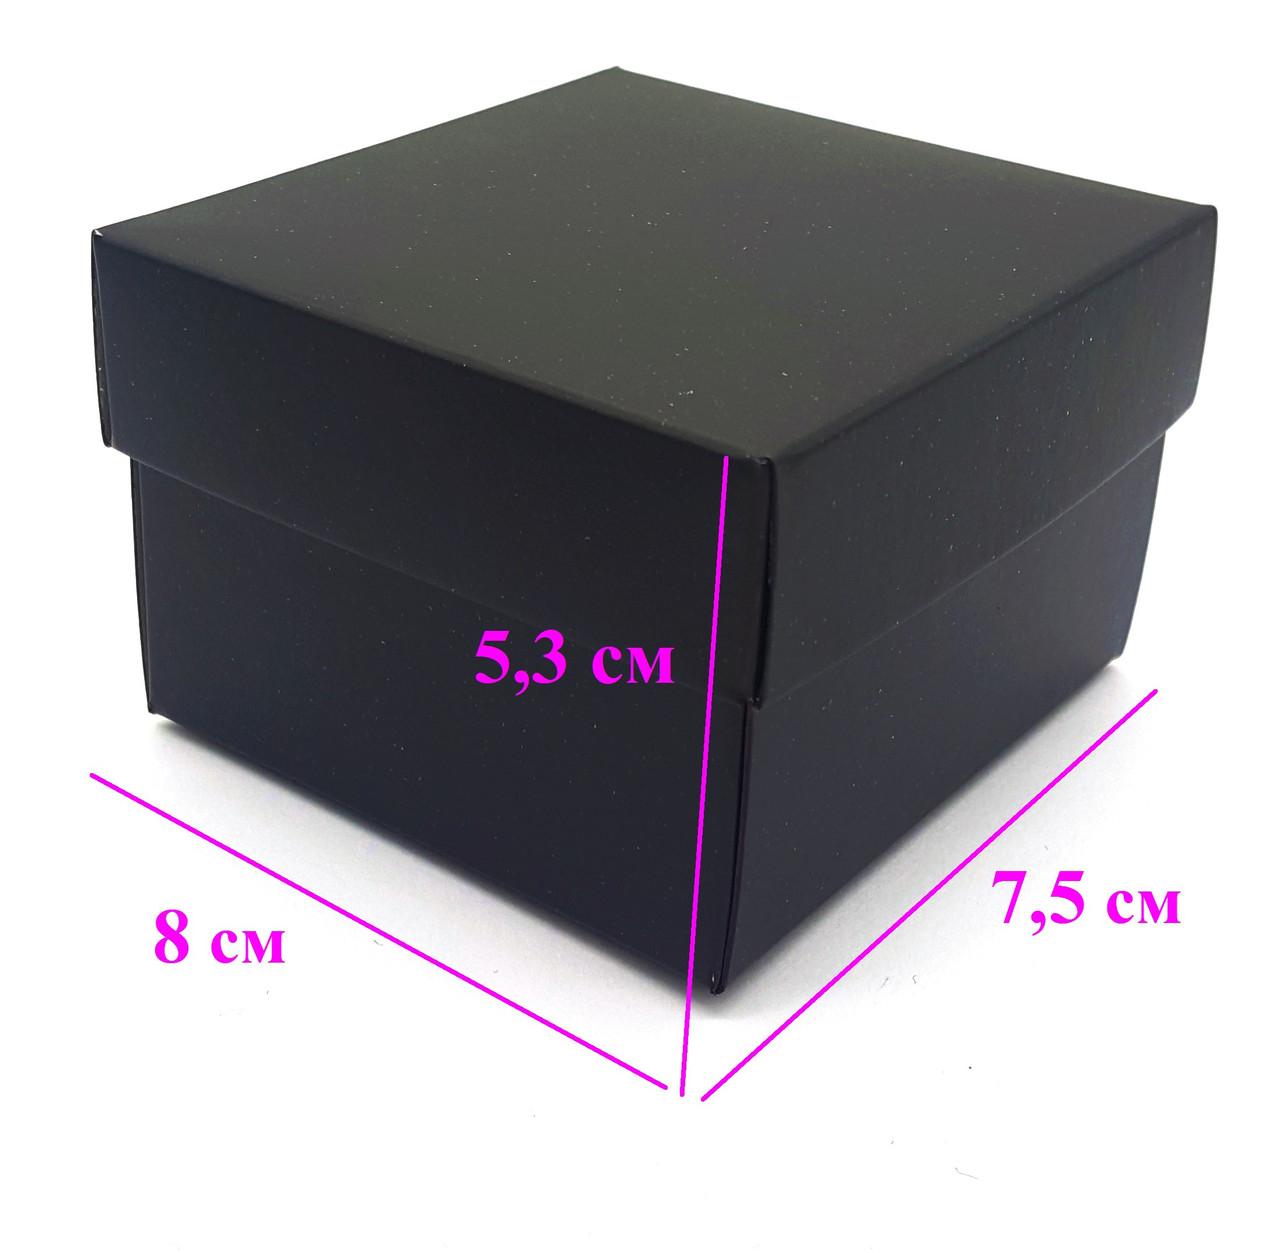 Подарочная Коробка на часы, Черная